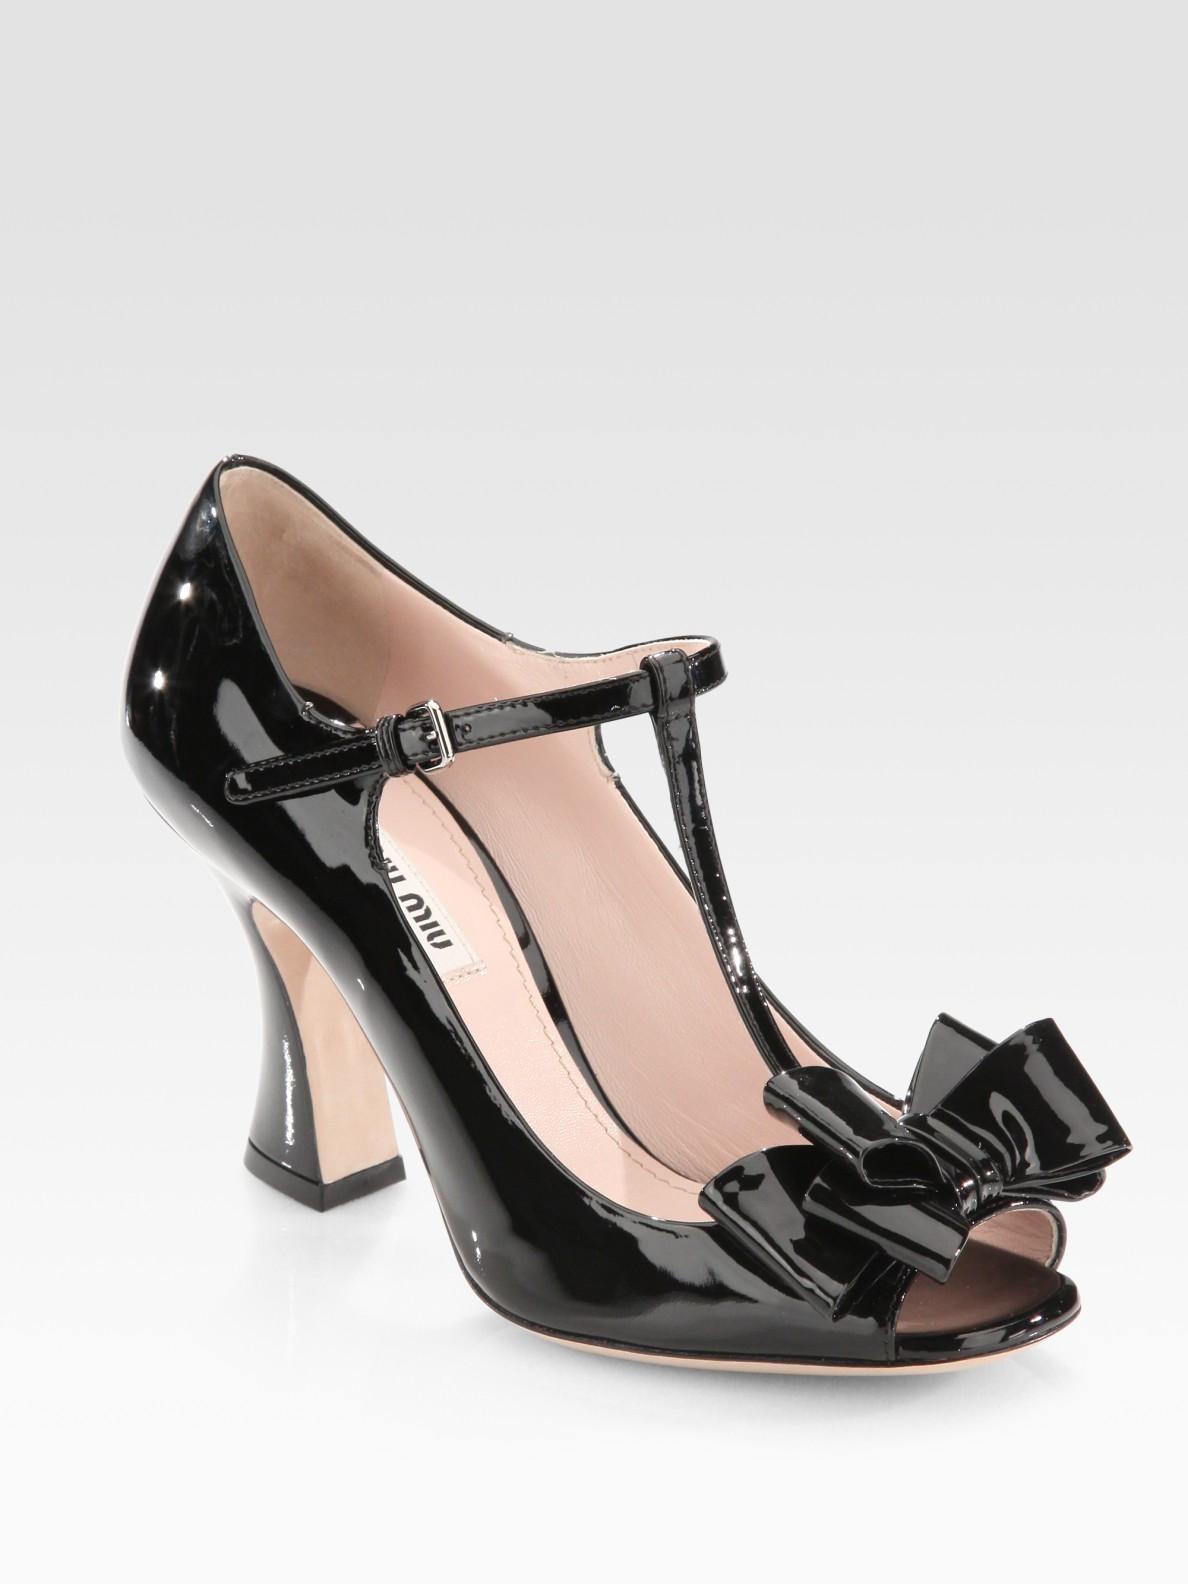 discount enjoy Miu Miu Patent Leather T-Strap Pumps clearance classic discount real r7j7jr4U